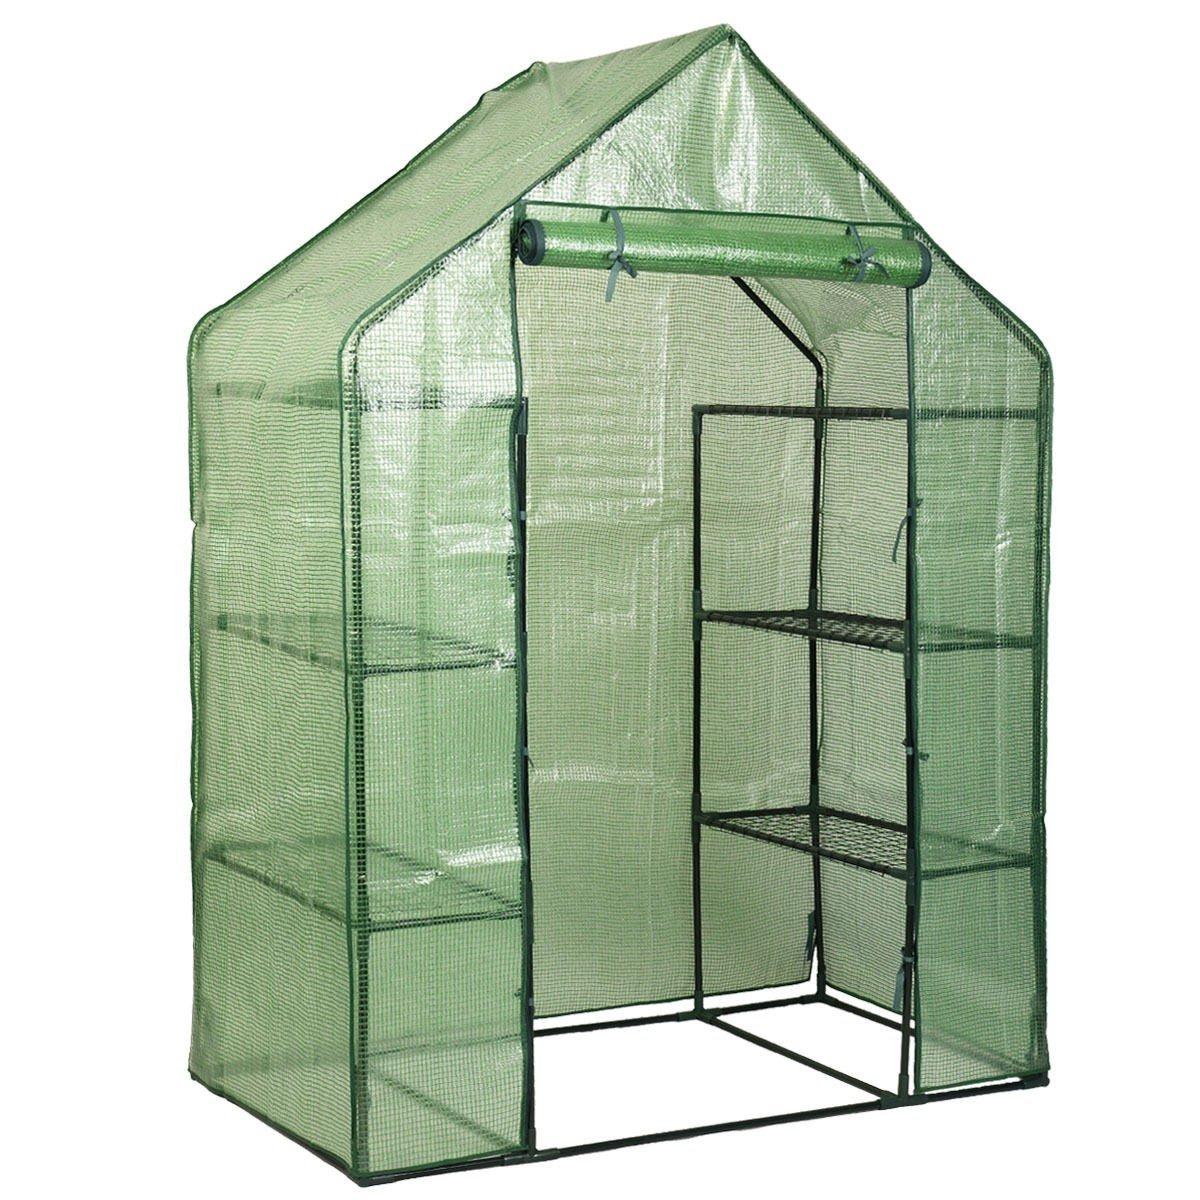 MRT SUPPLY Portable Mini Outdoor Walk-in 8 Shelves Greenhouse Ebook